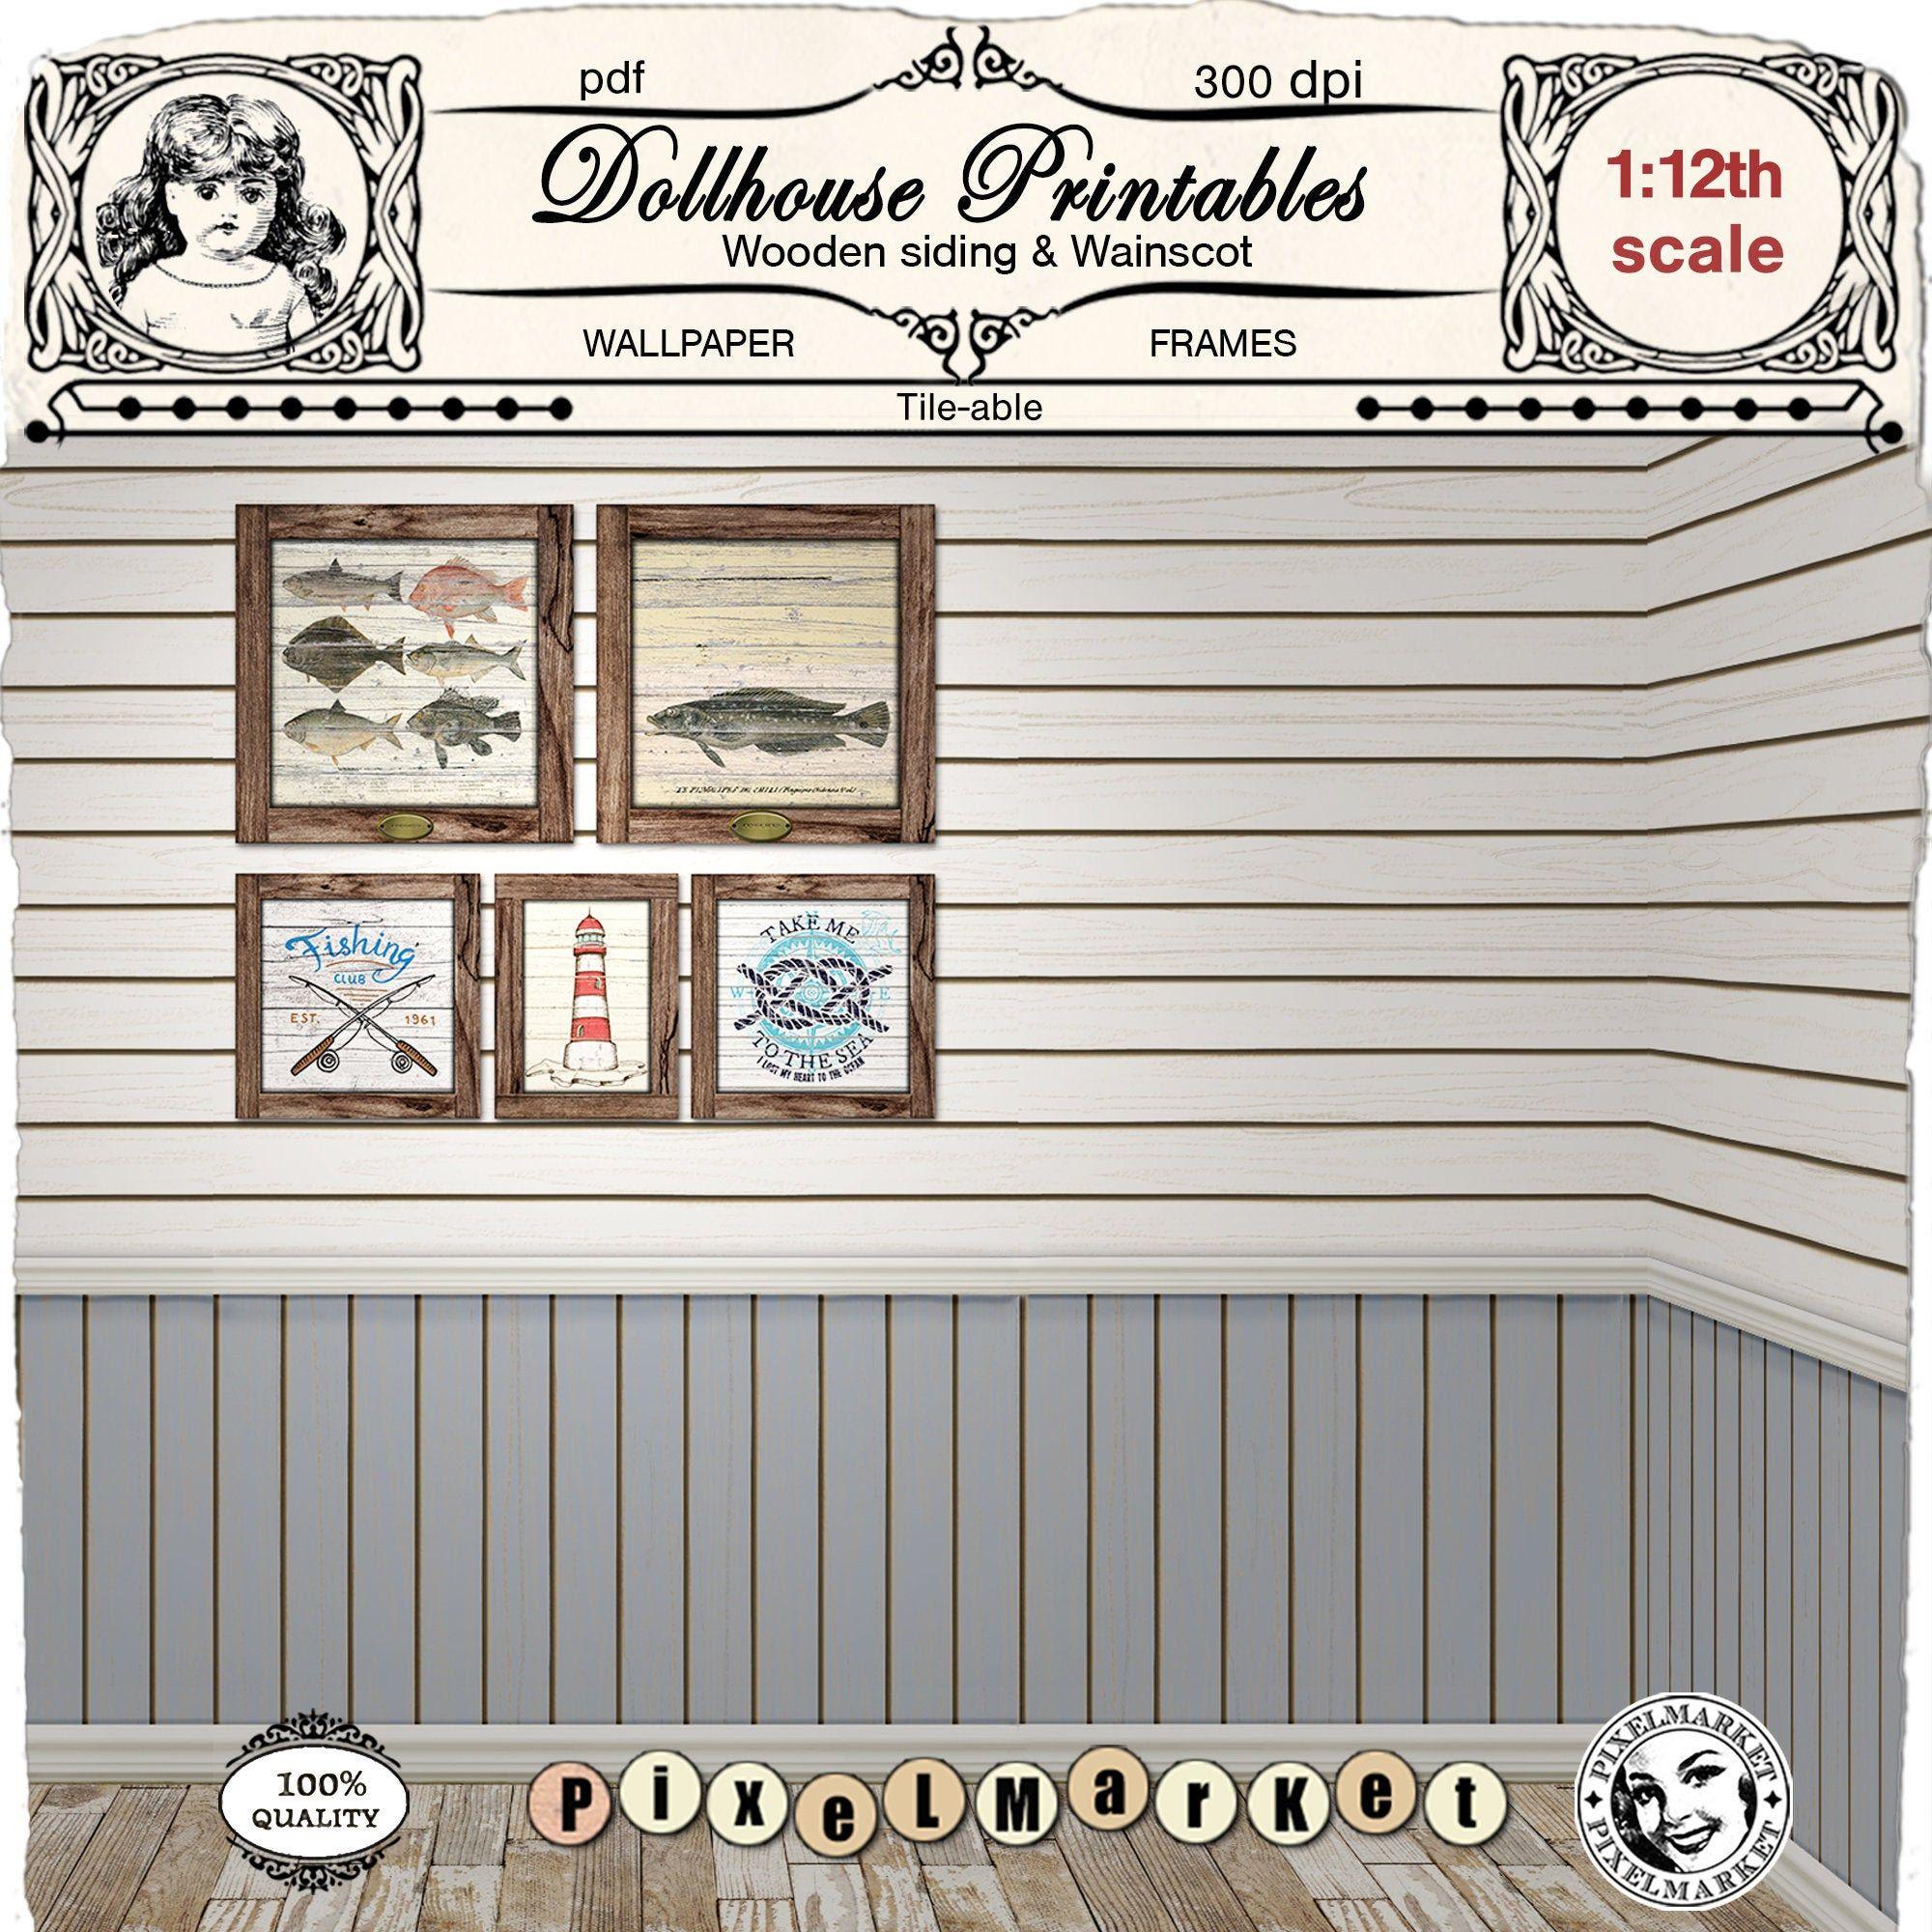 Dollhouse Printable Wallpaper 1 12 Miniature Cabin Log Siding Beach Cottage Shiplap Coastal Wallpaper Wooden Plank Beadboard Digital Sheet In 2020 Wooden Planks Coastal Wallpaper Easy Tile